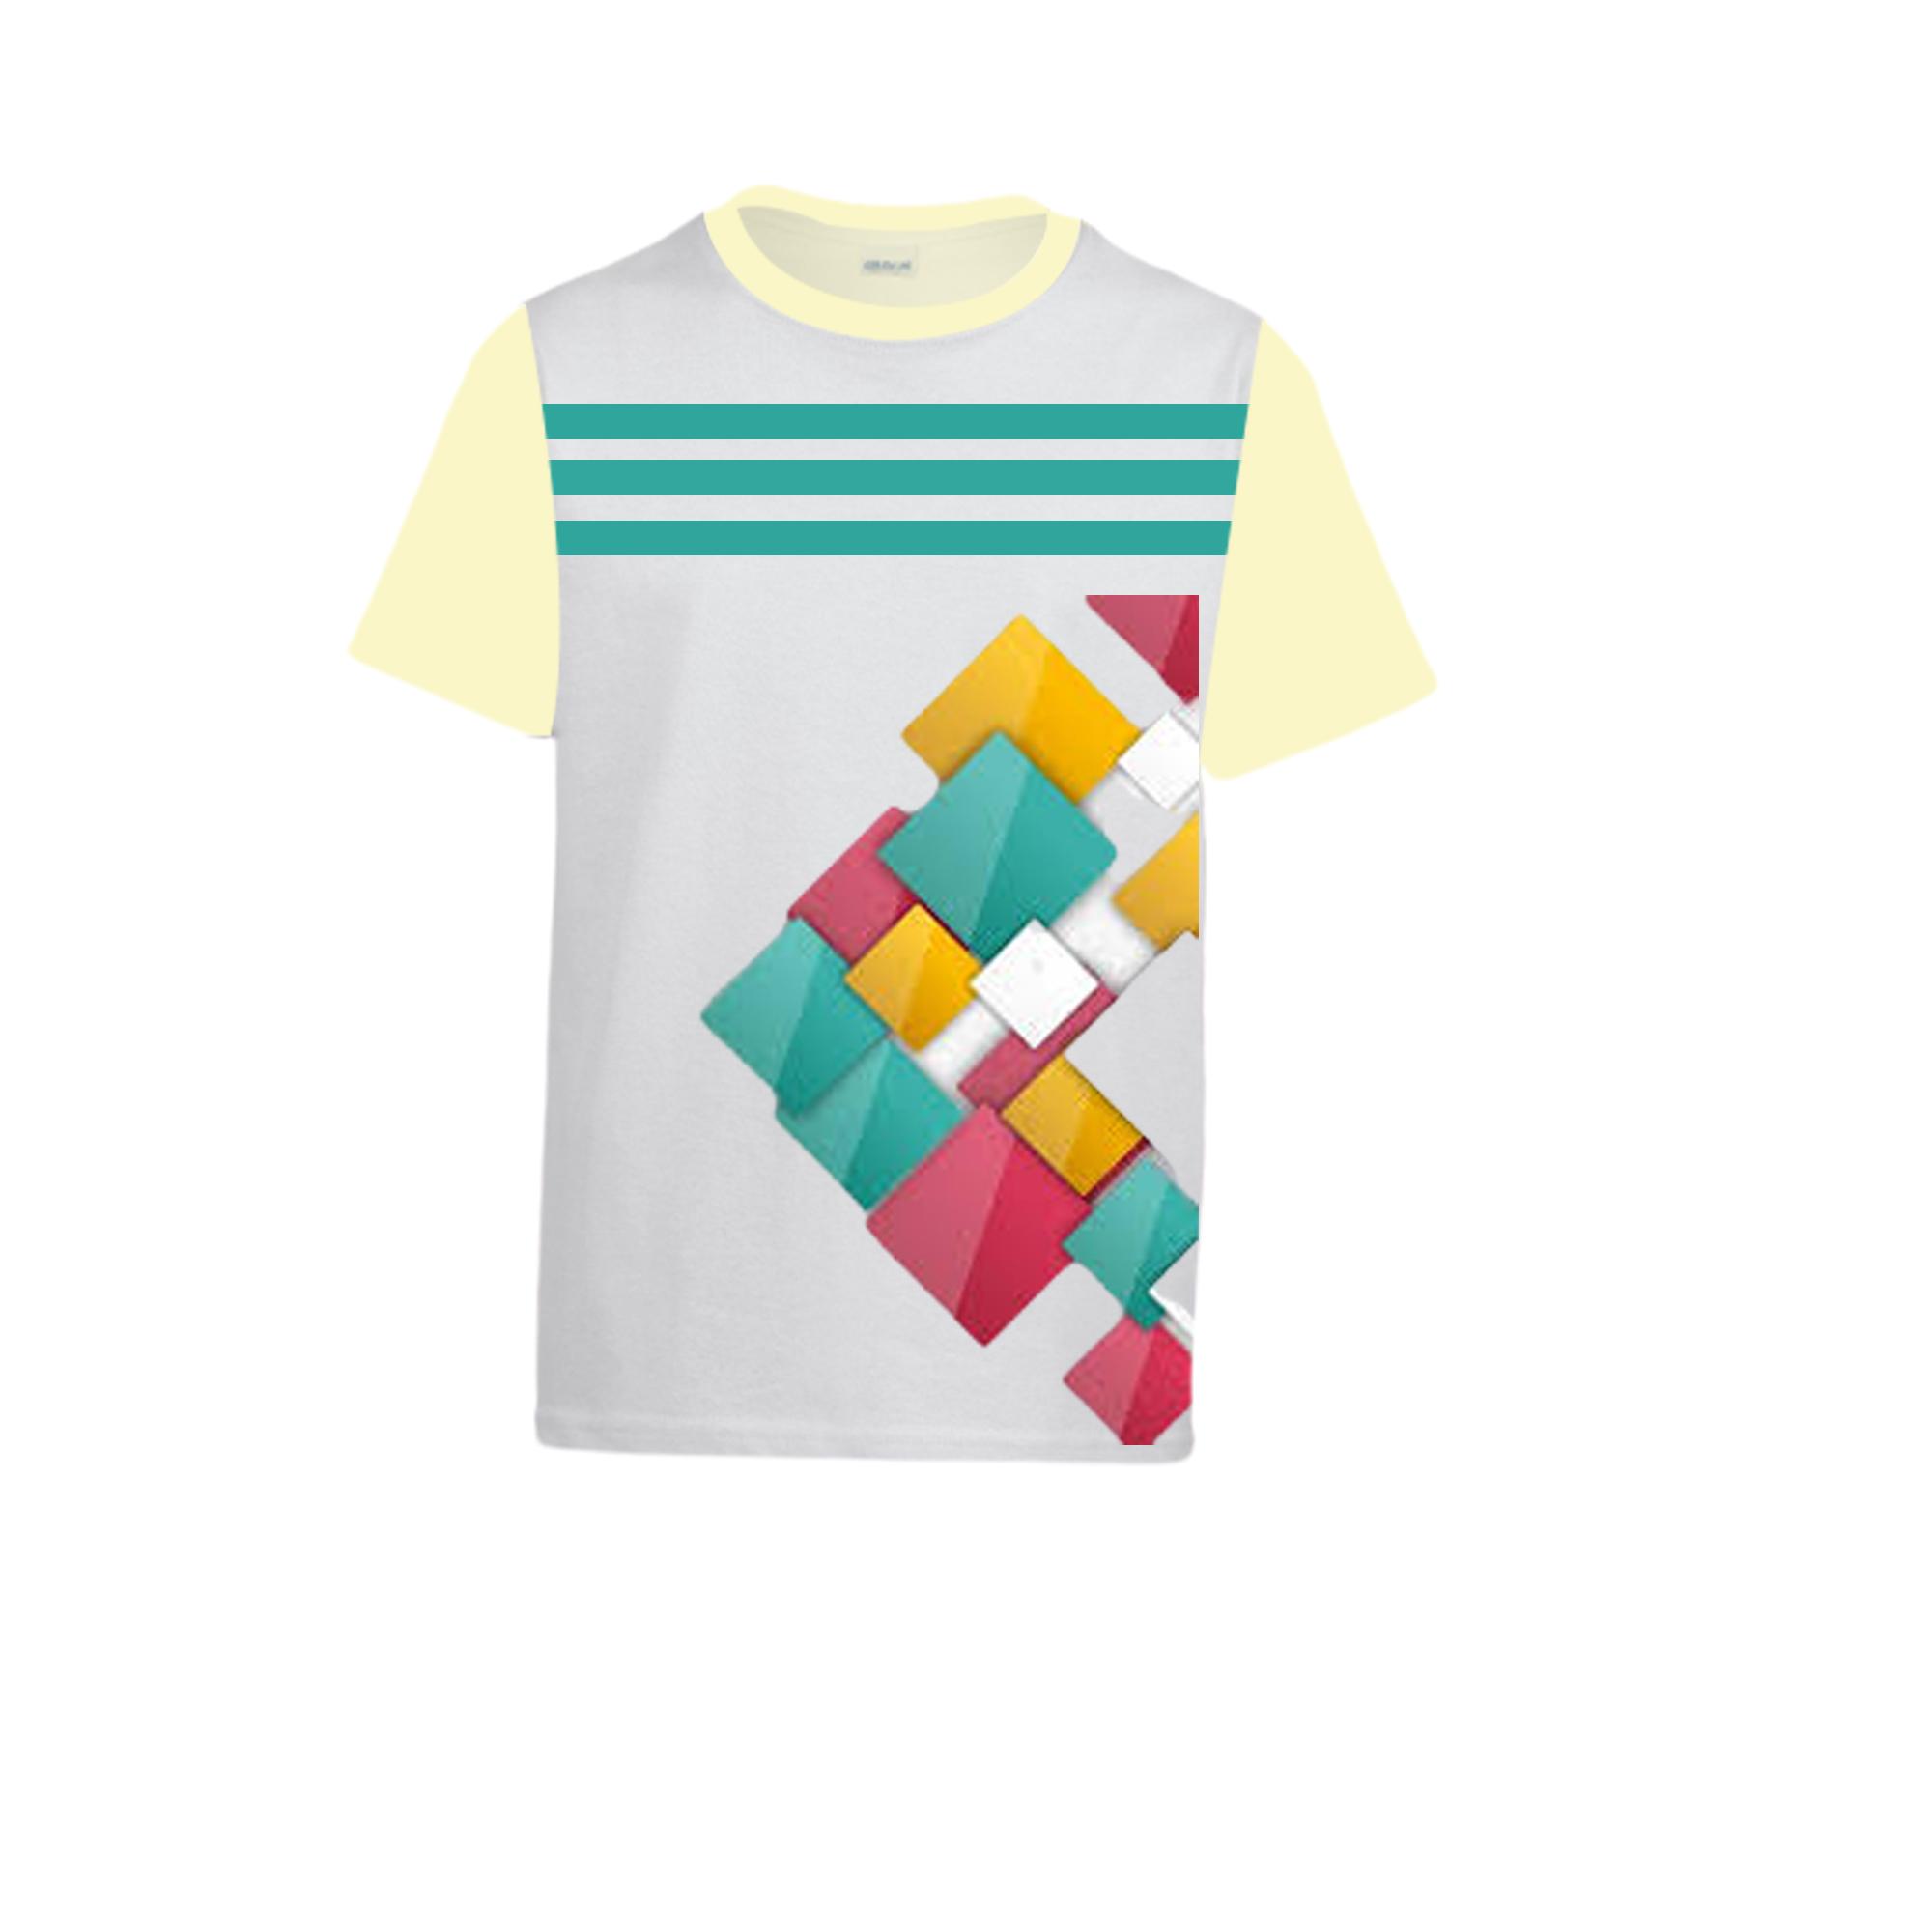 I will do minimalist typography t shirt design